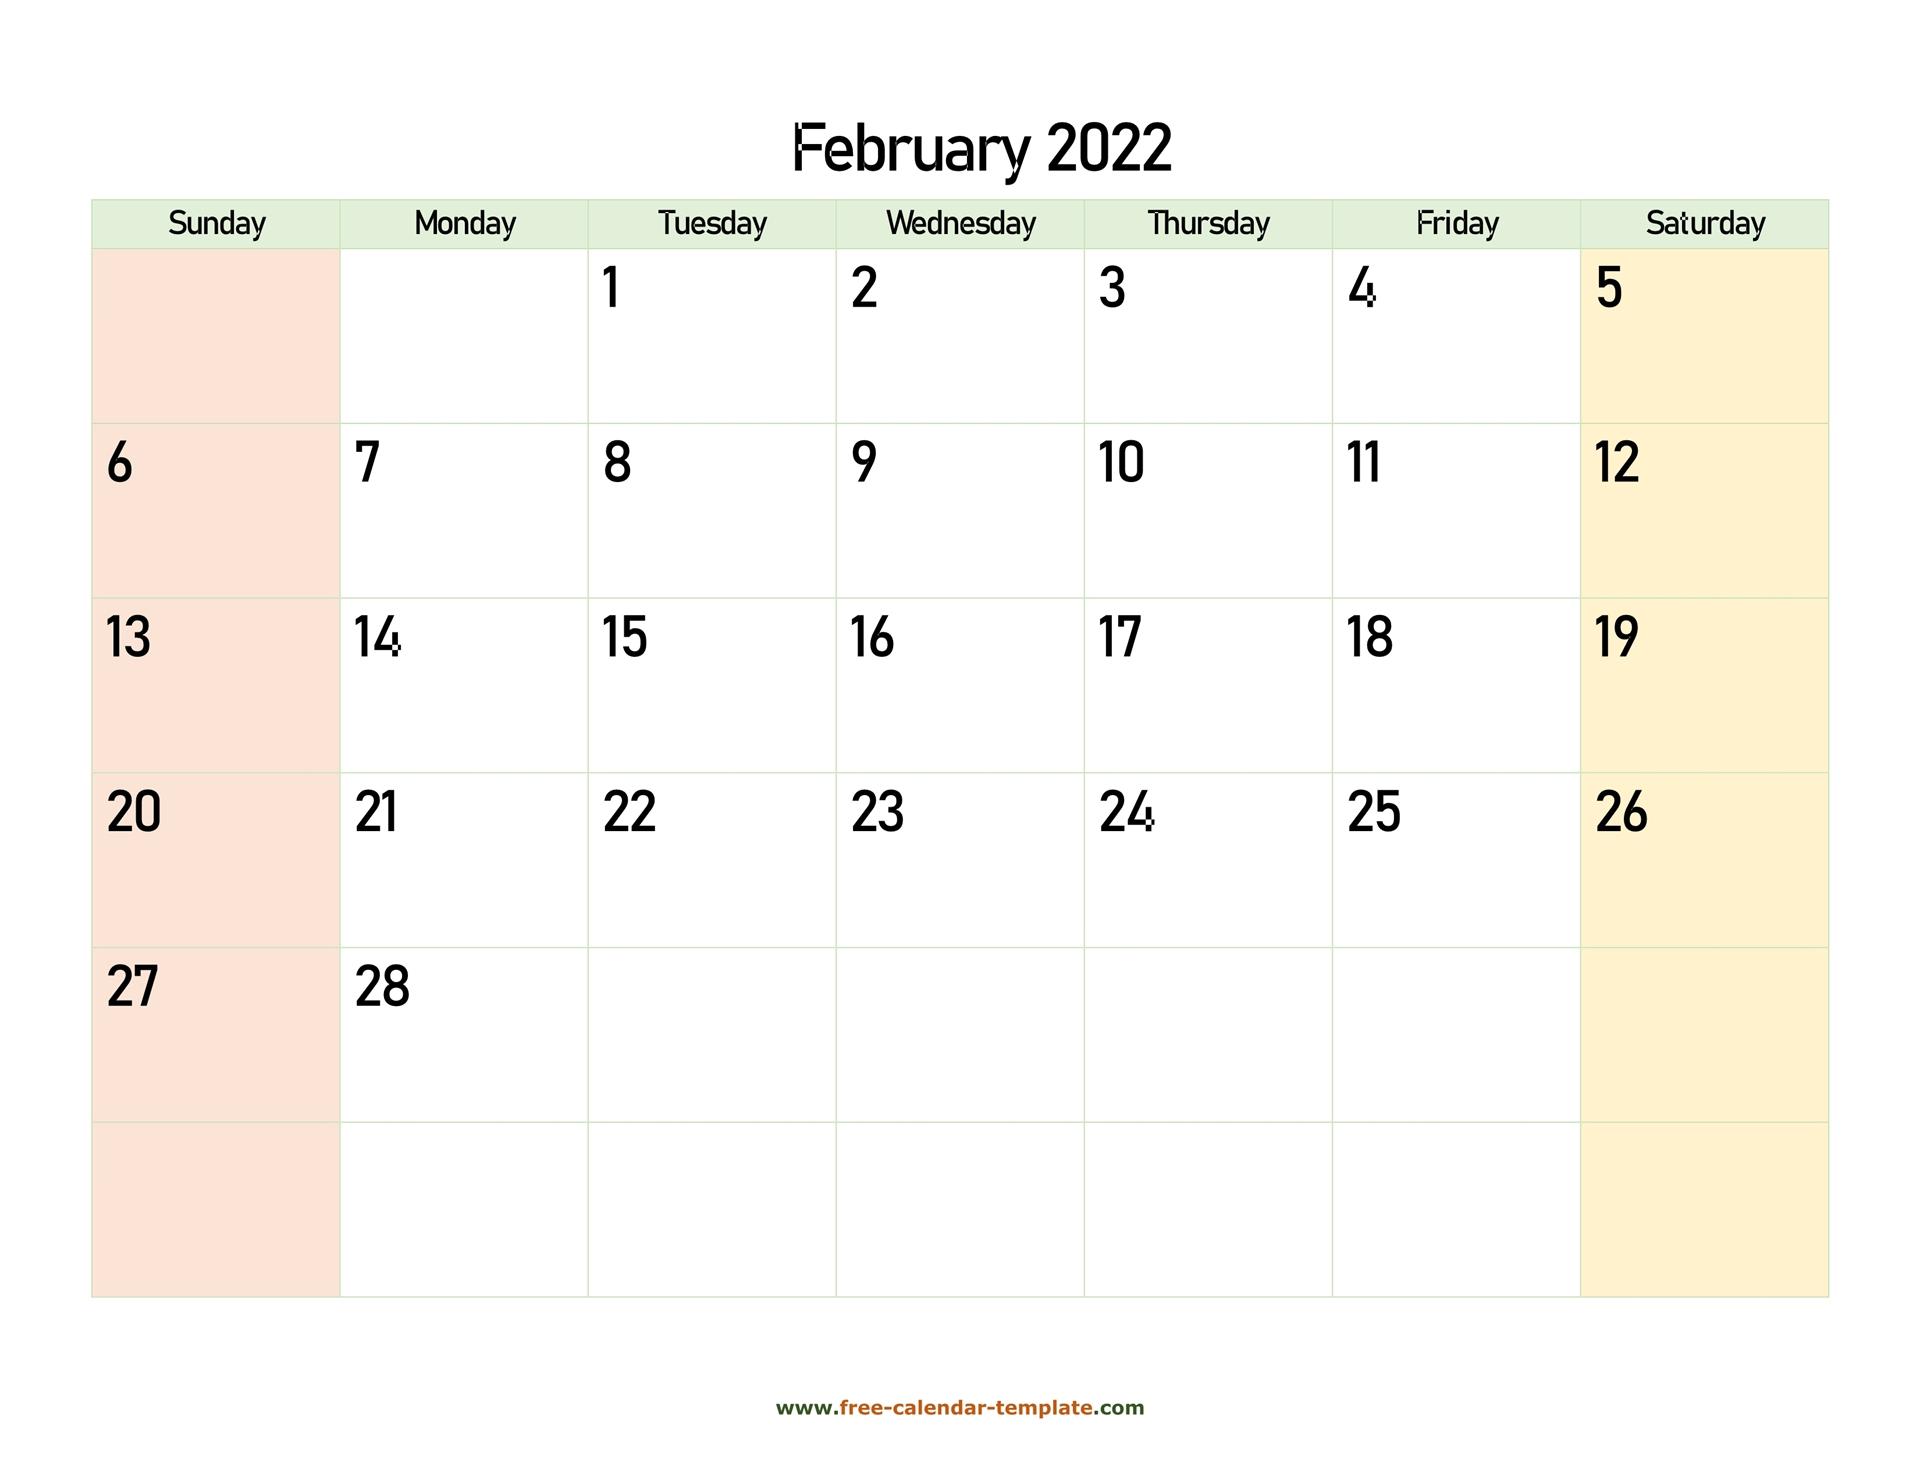 February 2022 Free Calendar Tempplate   Free Calendar With Printable Calendar February 2022